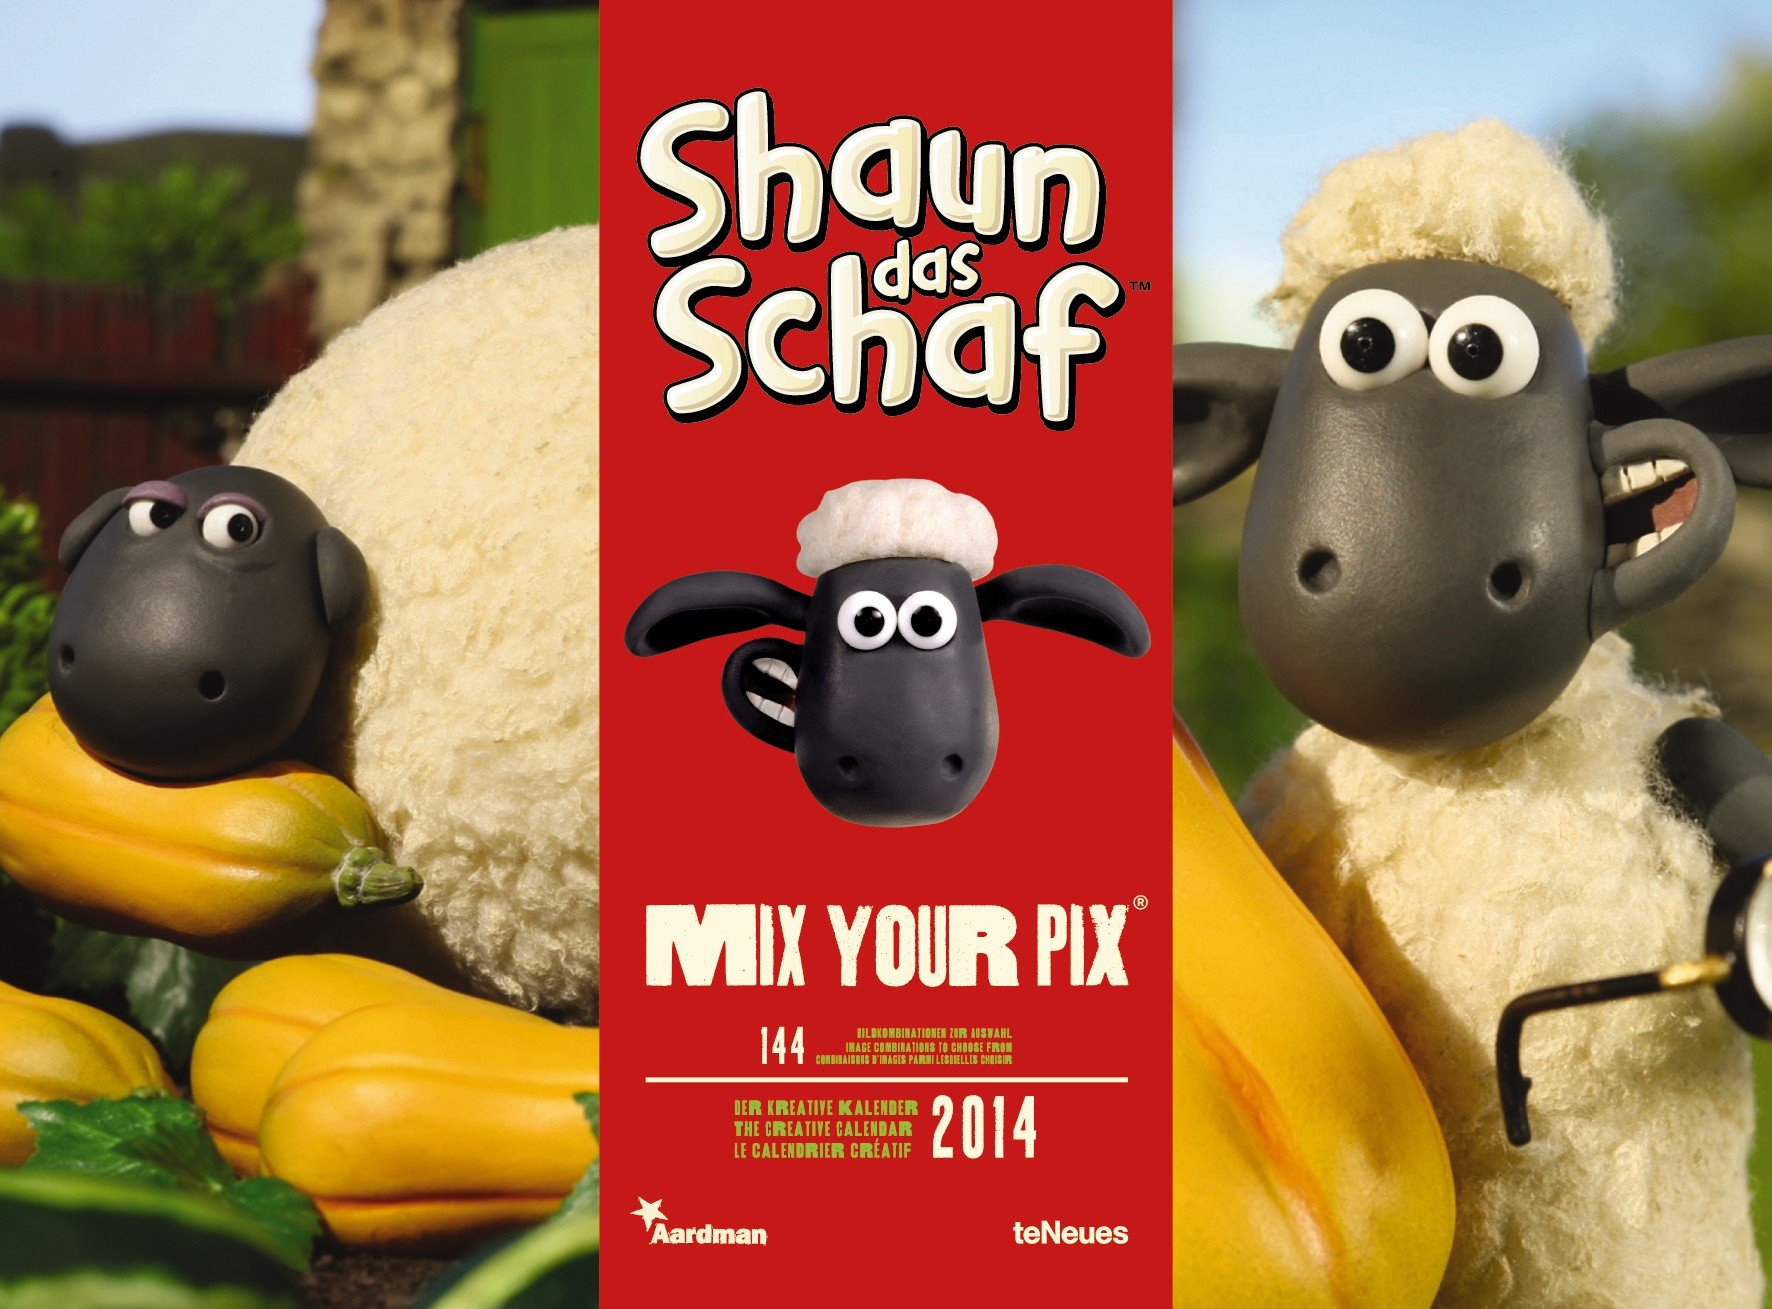 mix-your-pix-shaun-das-schaf-2014